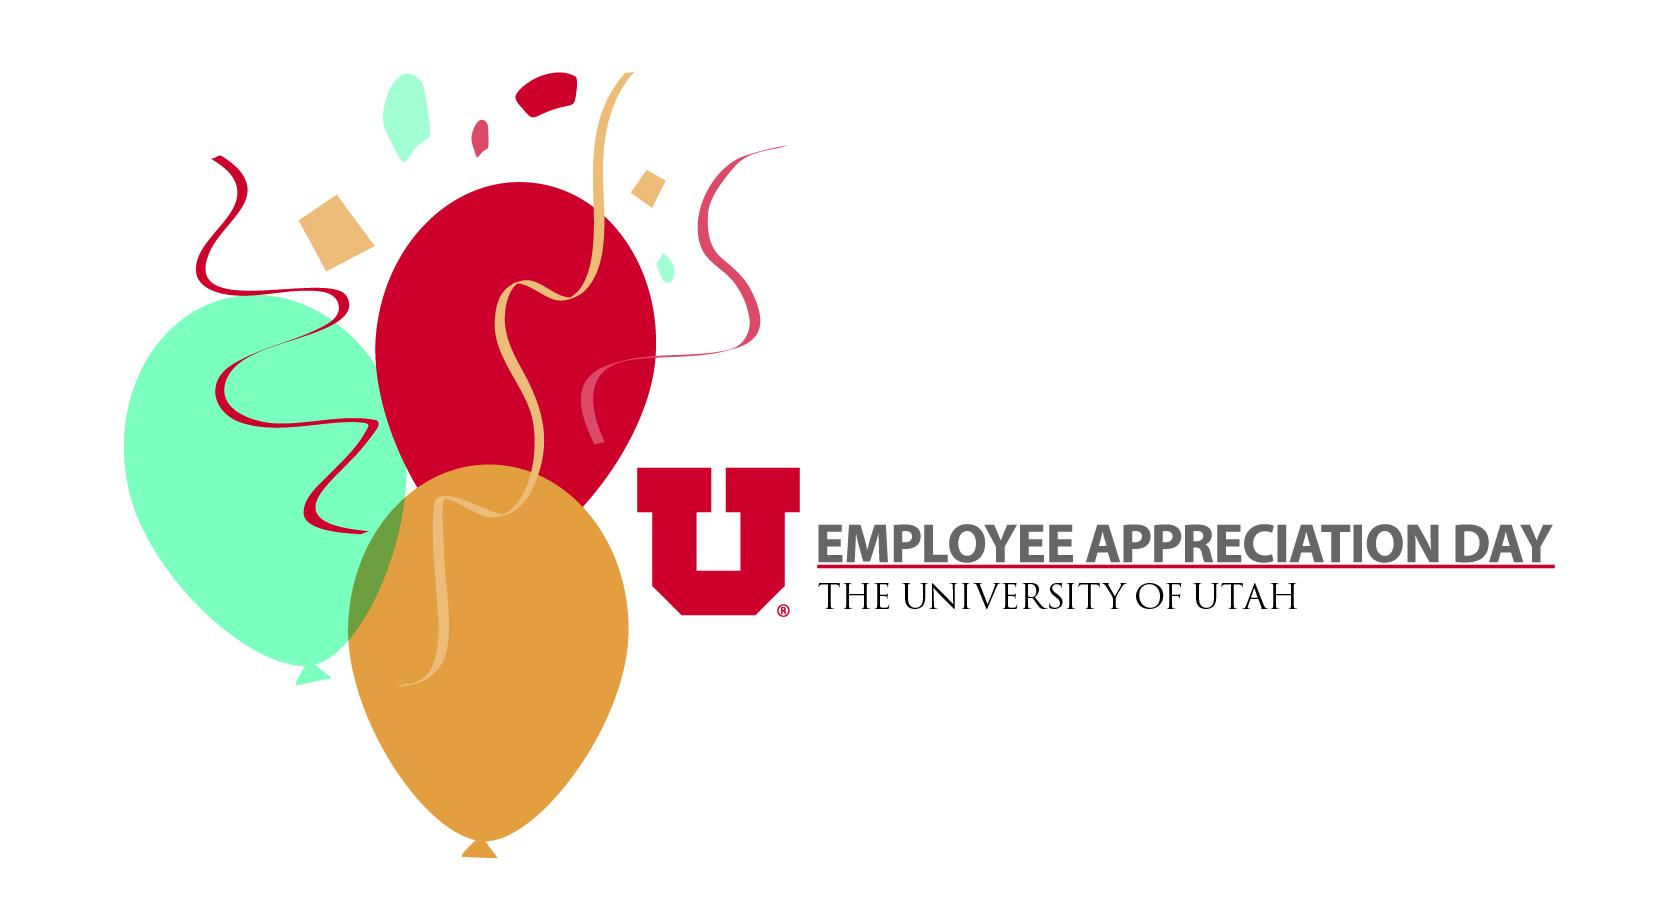 Employee Appreciation Day Clip Art Free N2 free image.